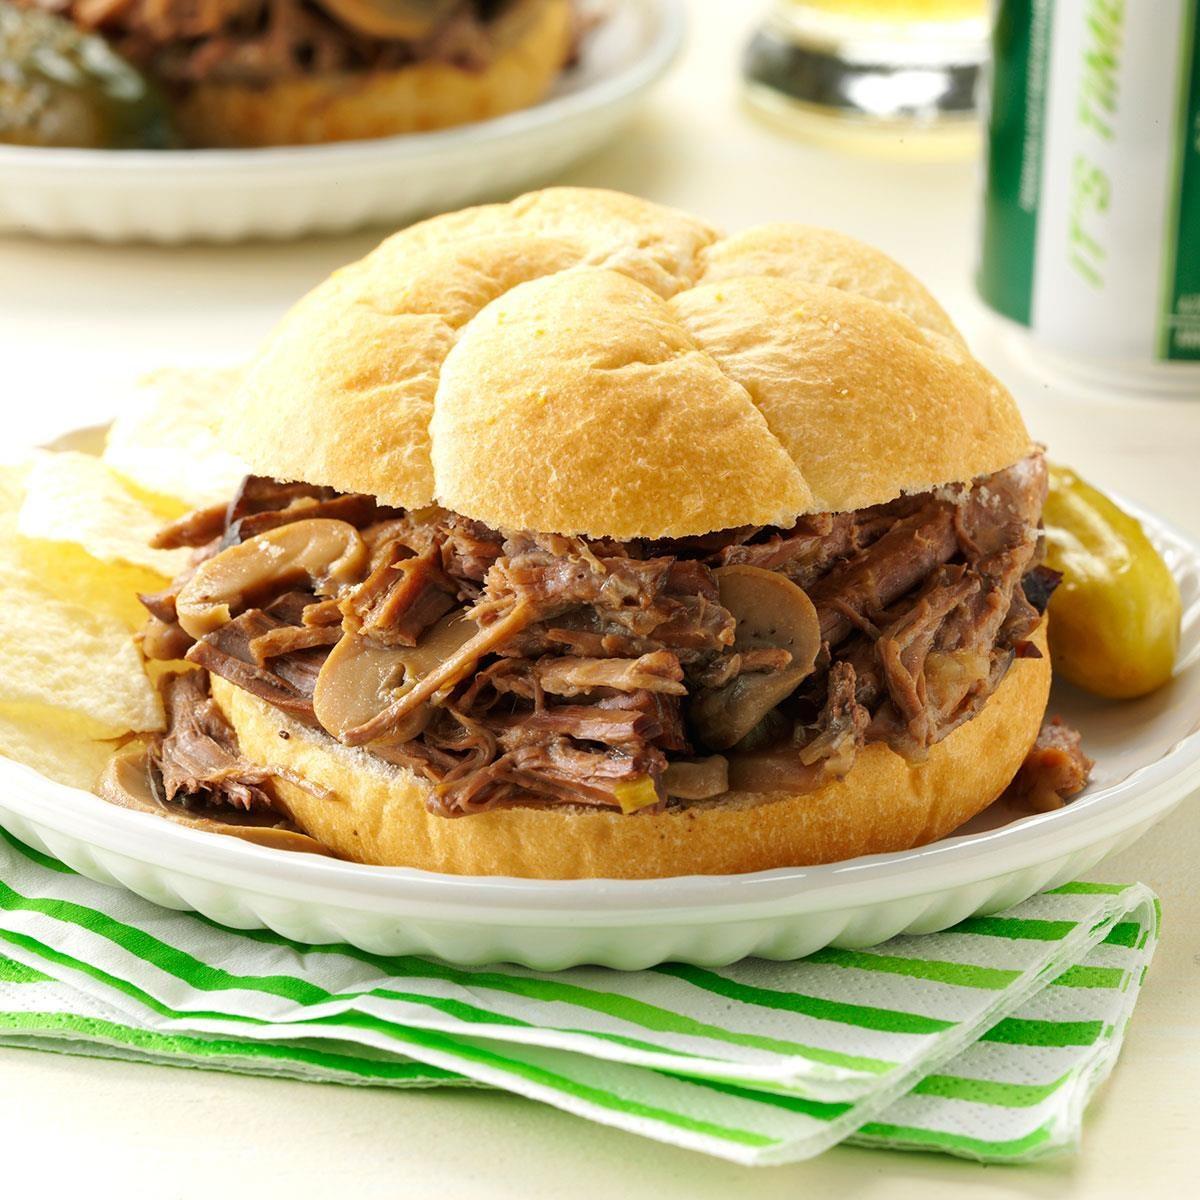 Inspired by: Arby's Roast Beef Sandwich